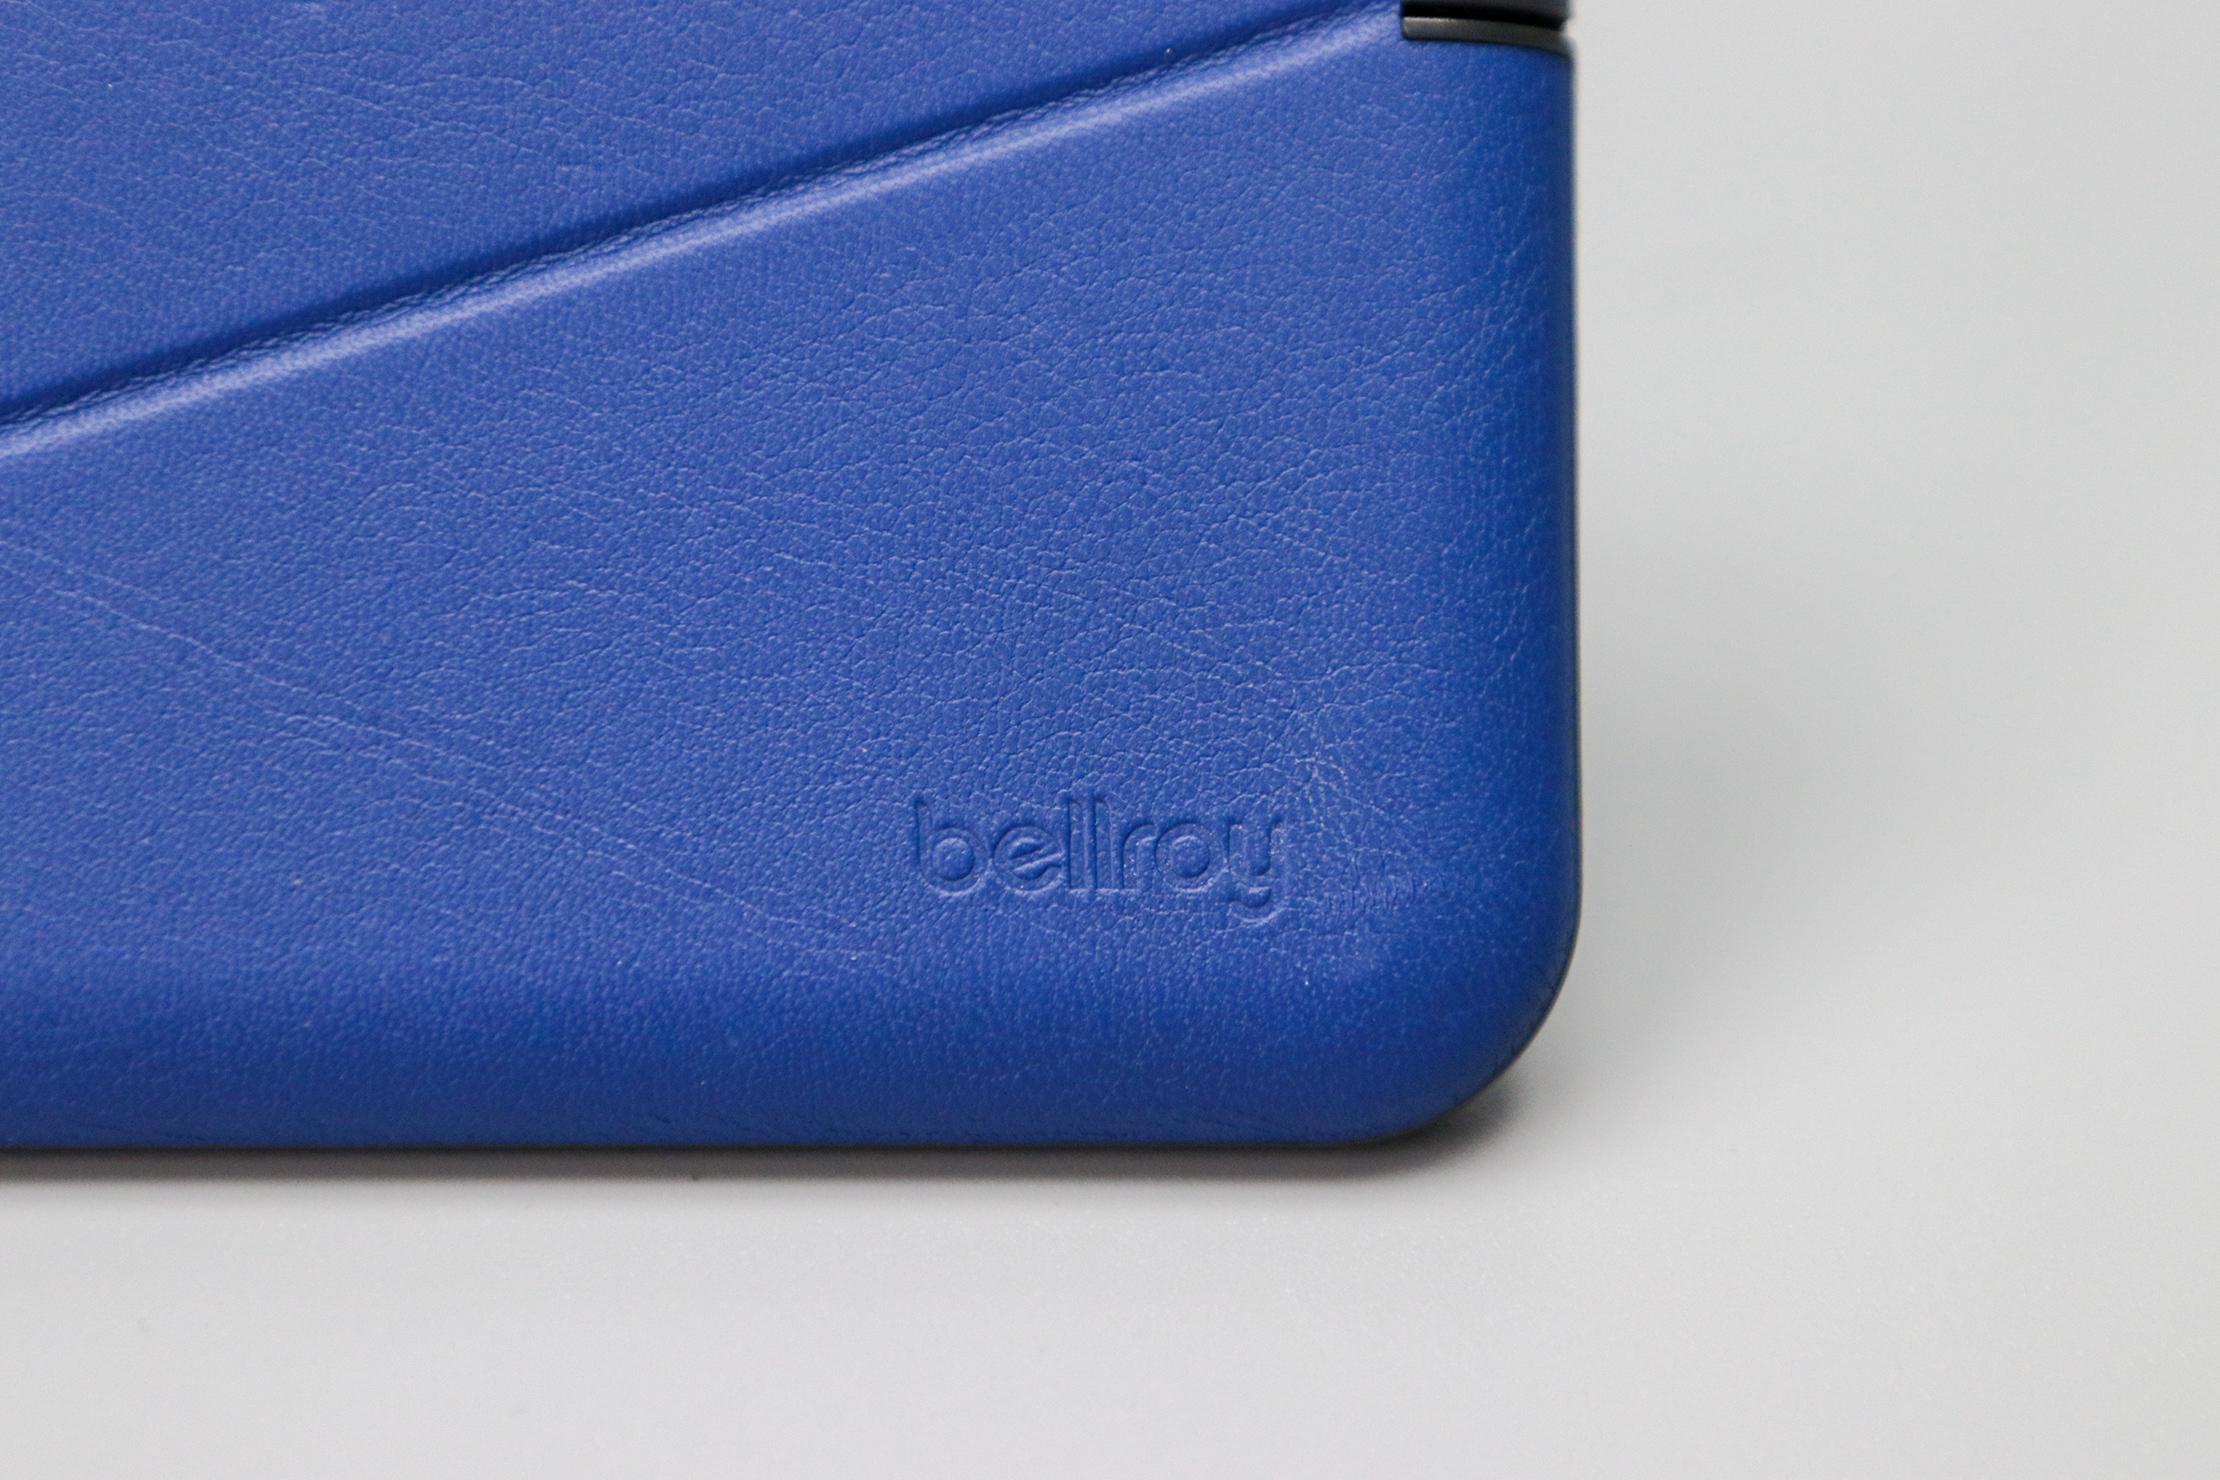 Bellroy Flip Case Logo